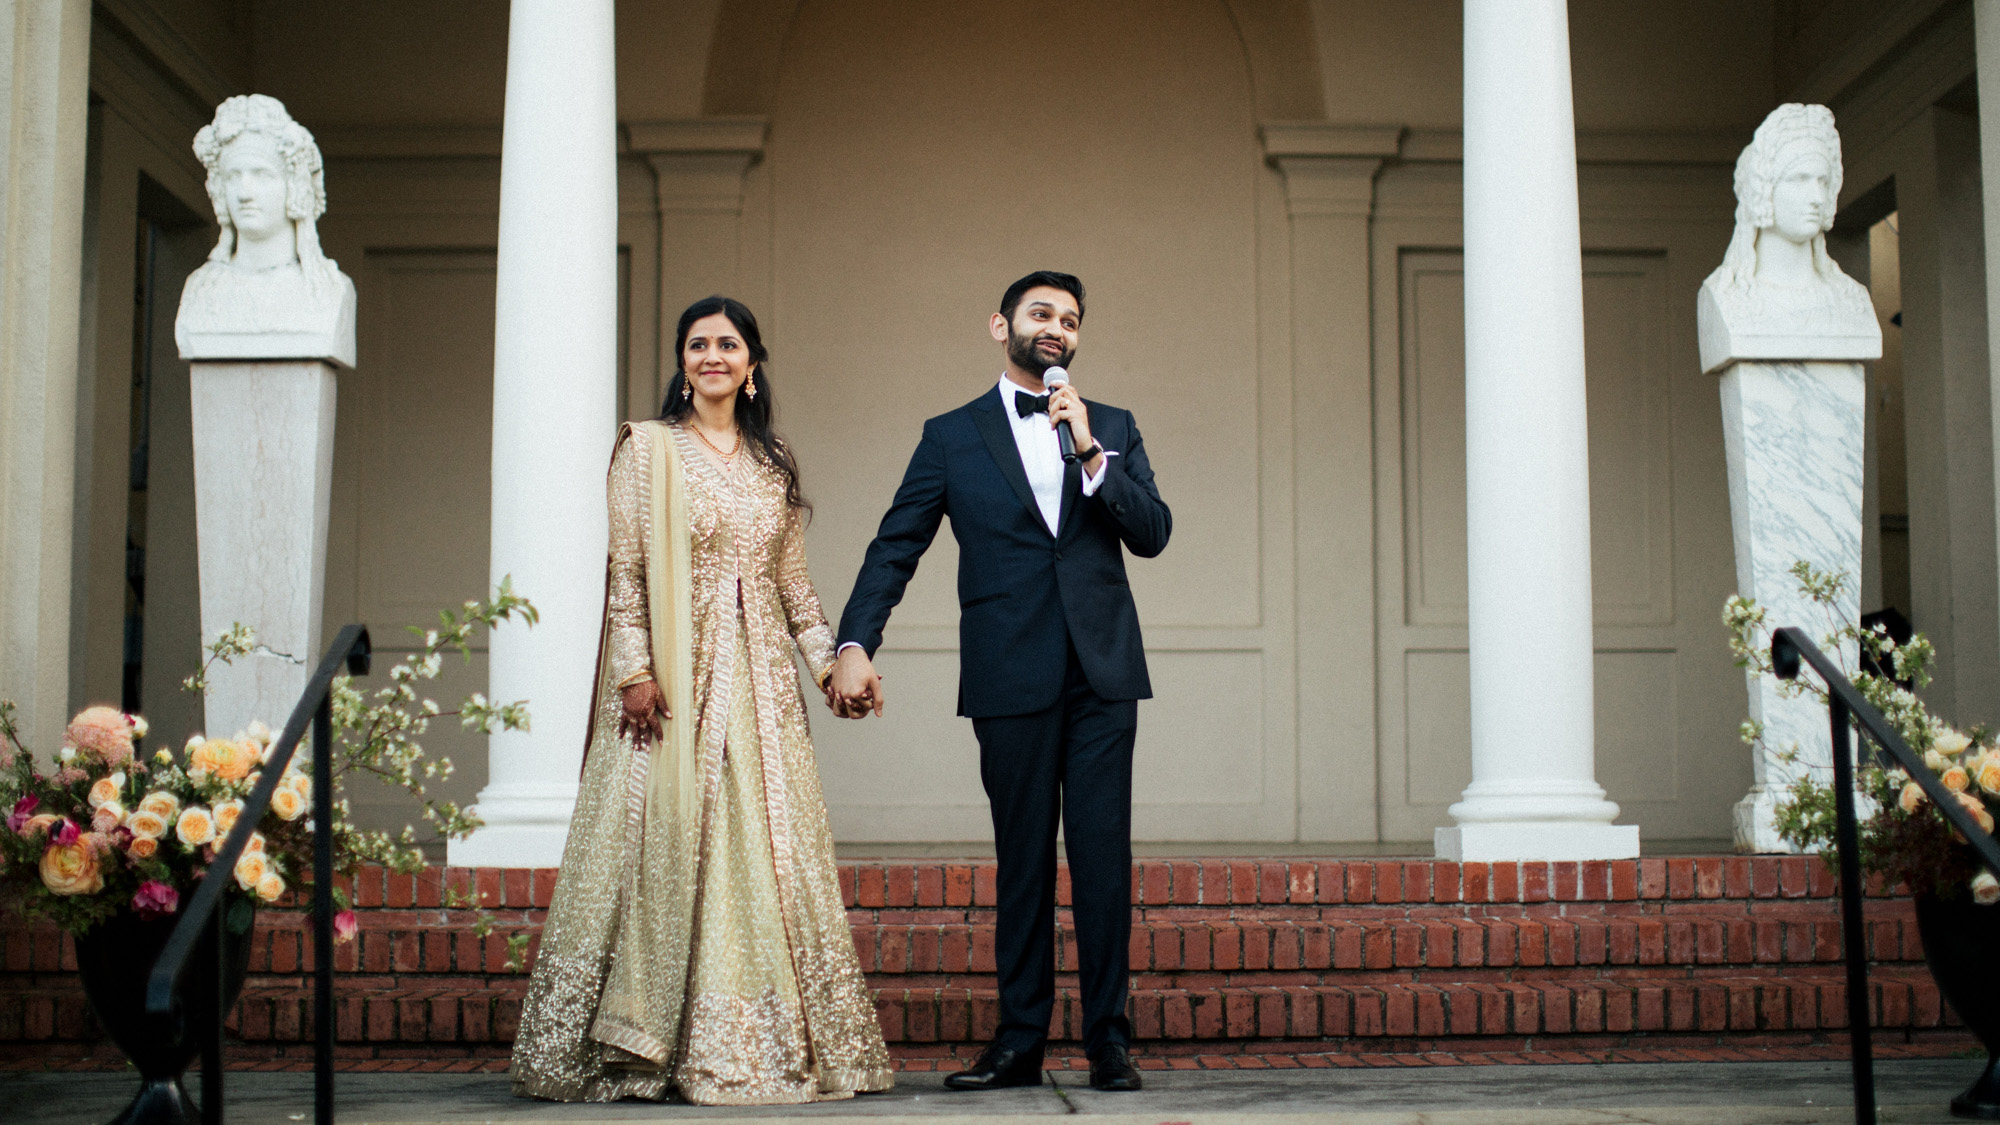 anu_maneesh_alec_vanderboom_Indian_wedding_photography-0158.jpg